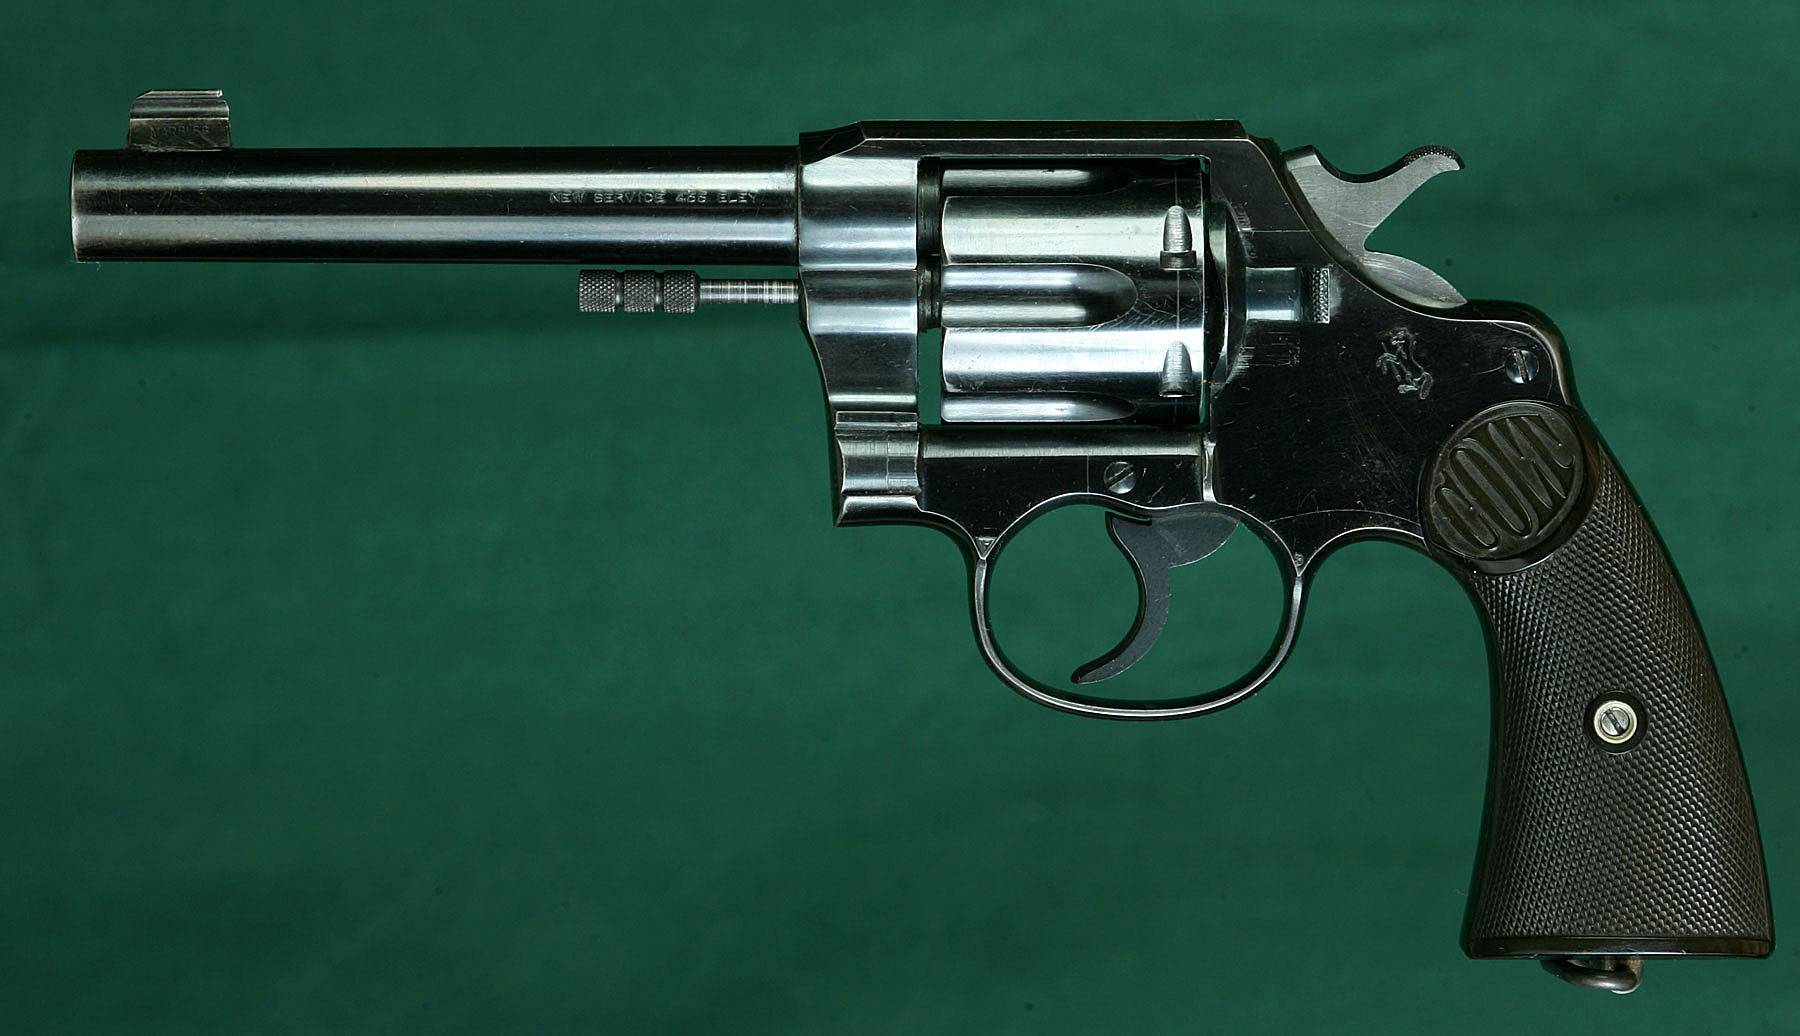 Colt new service — википедия (с комментариями)